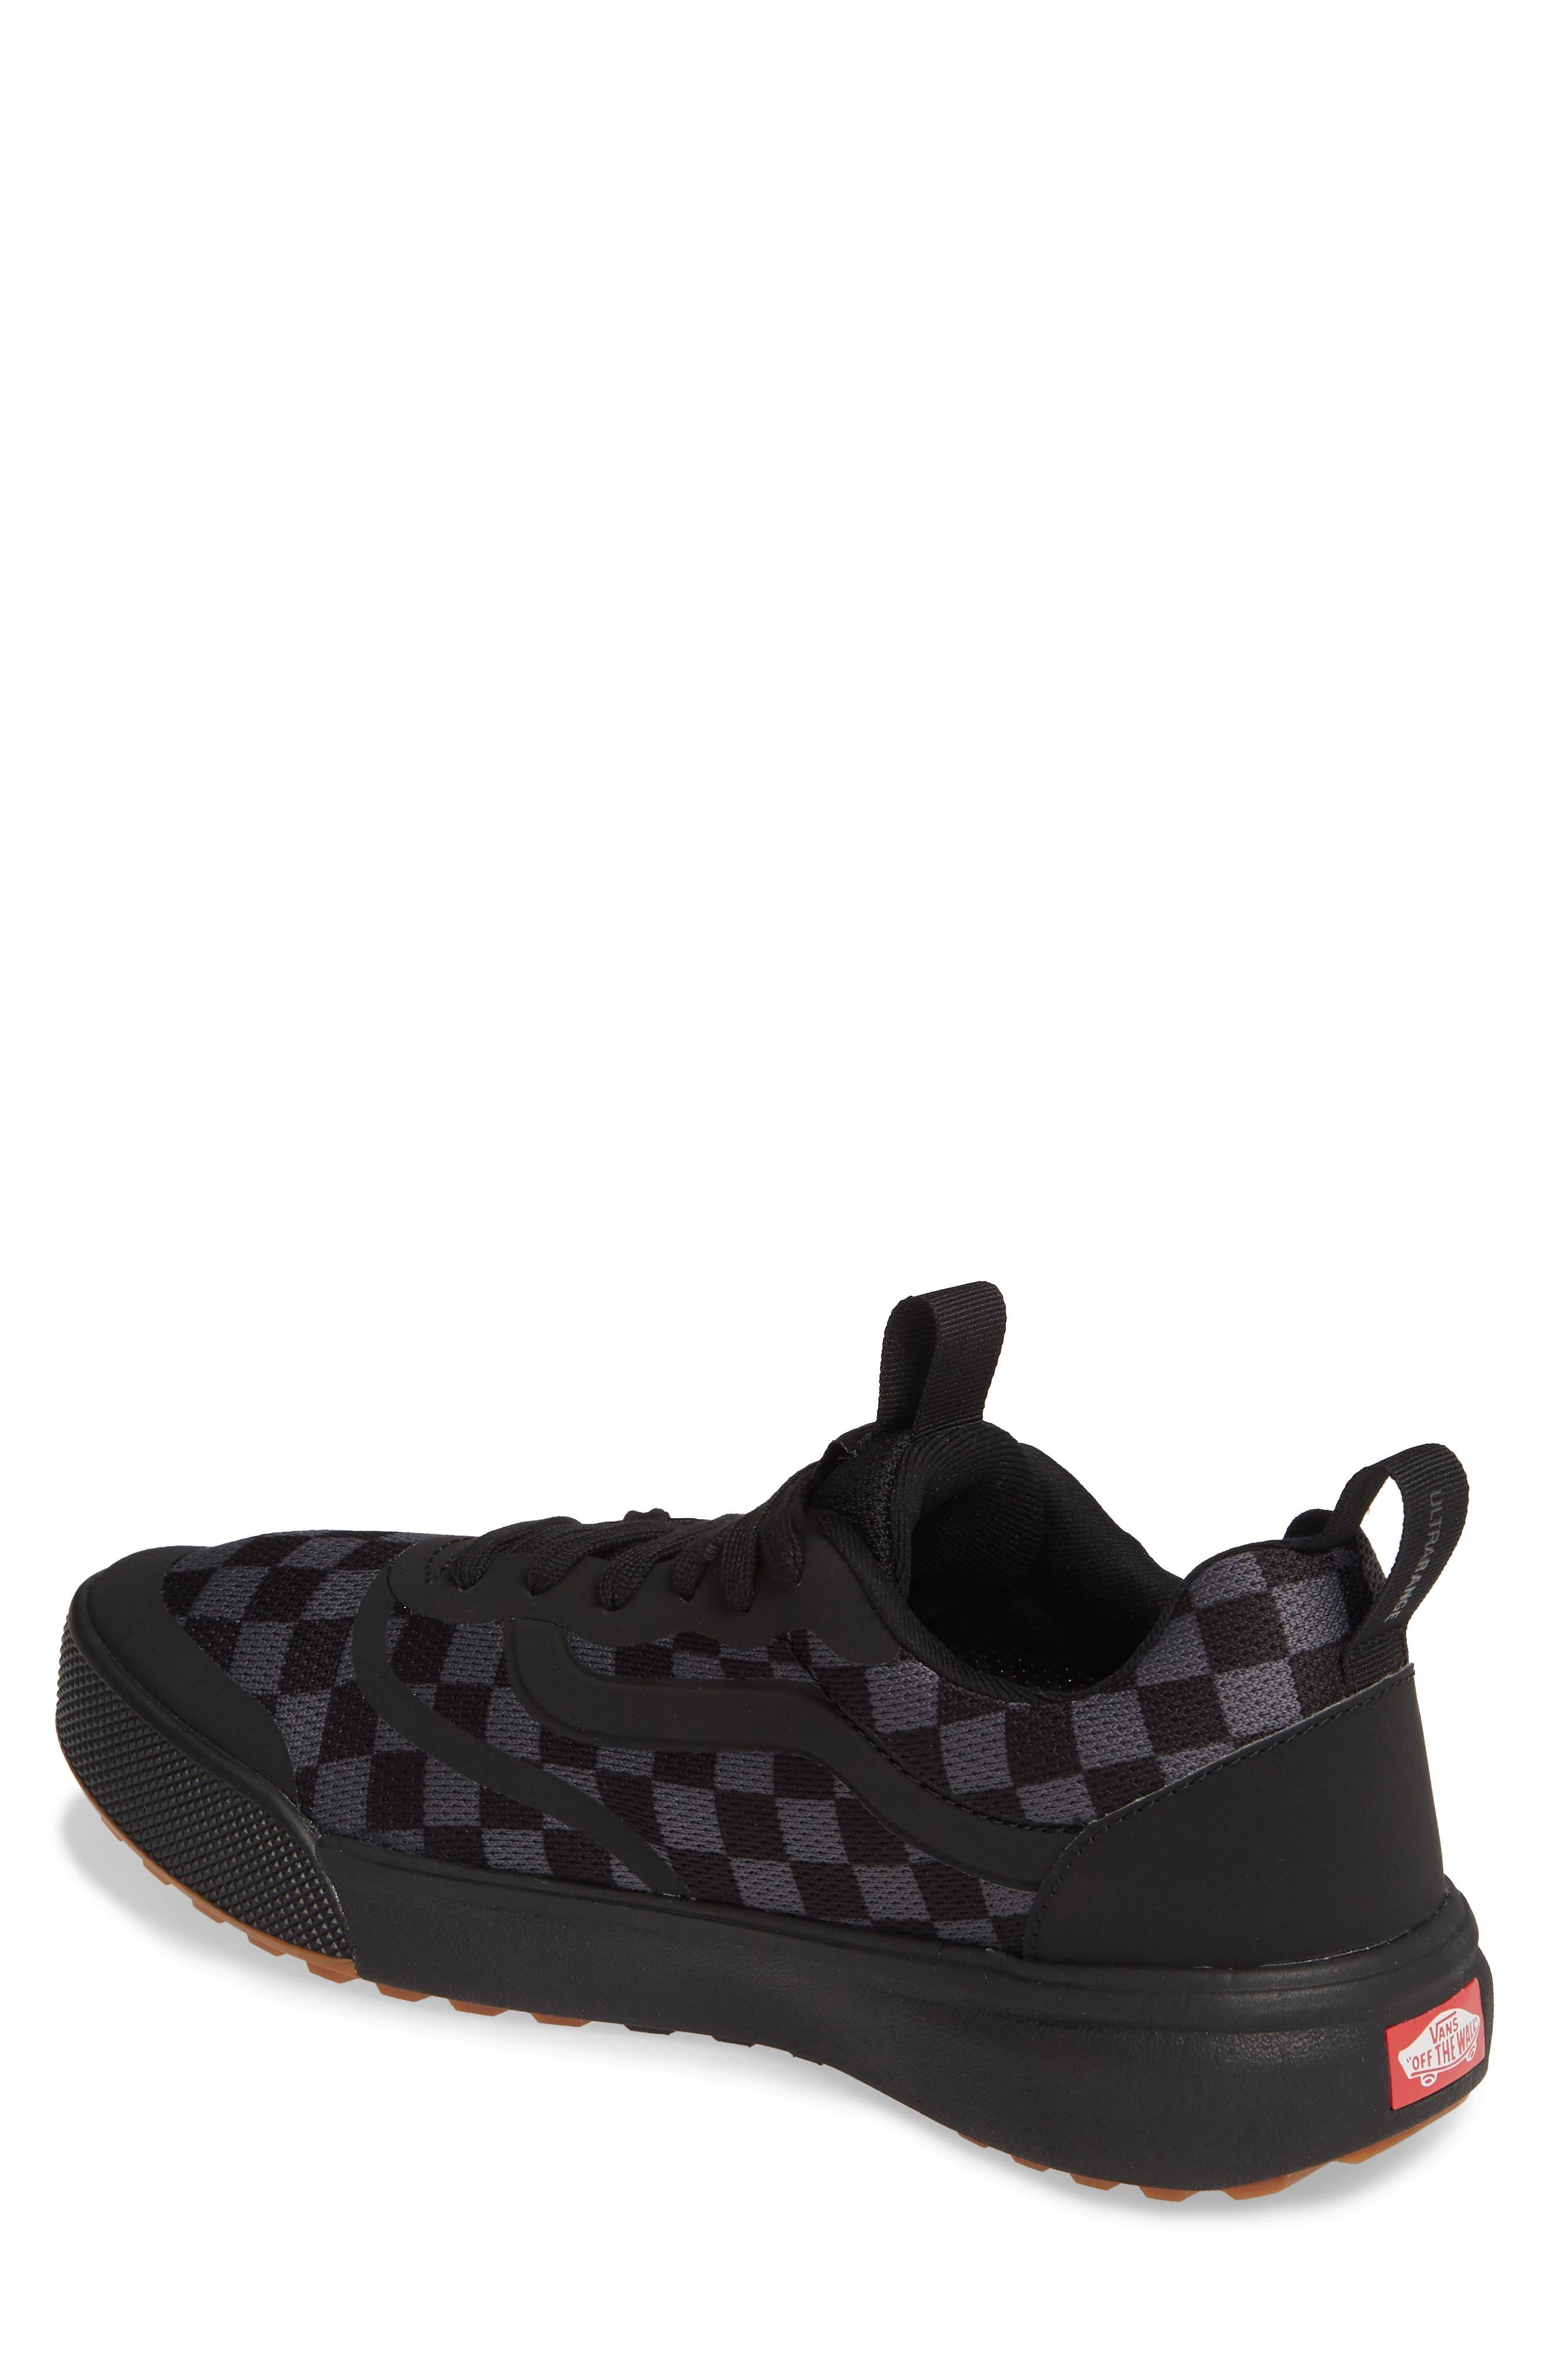 VANS,                             UltraRange Rapidwield Sneaker,                             Alternate thumbnail 2, color,                             003